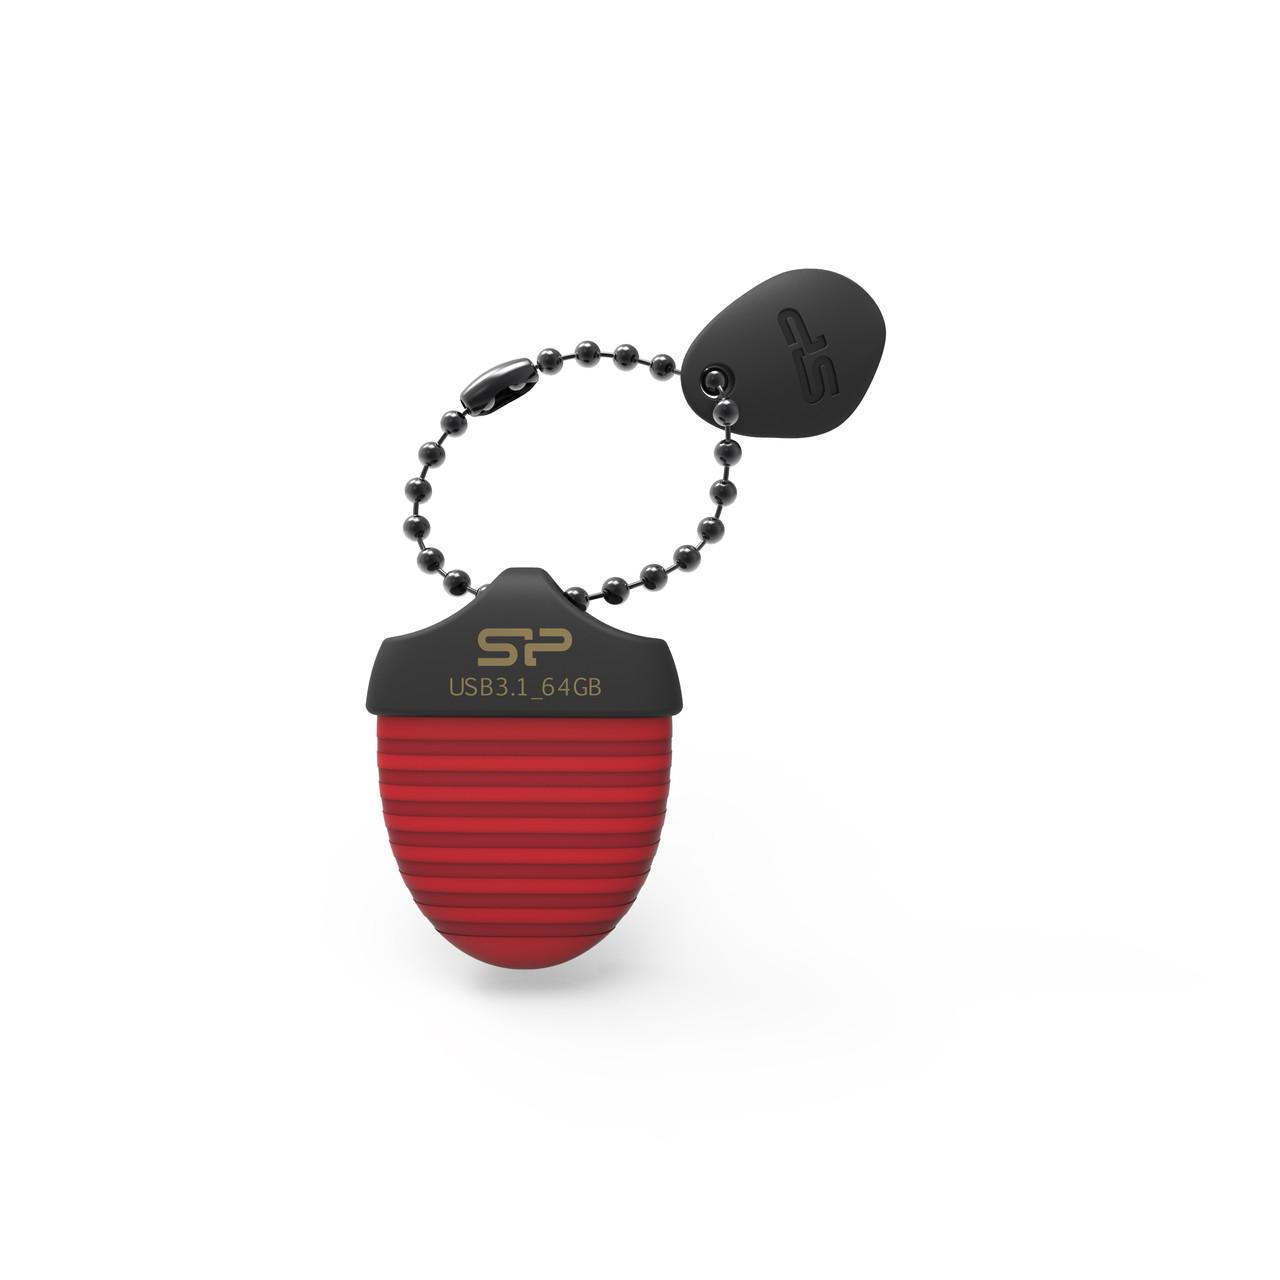 Флешка USB 3.1 SiliconPower Jewel J30 64Gb Red